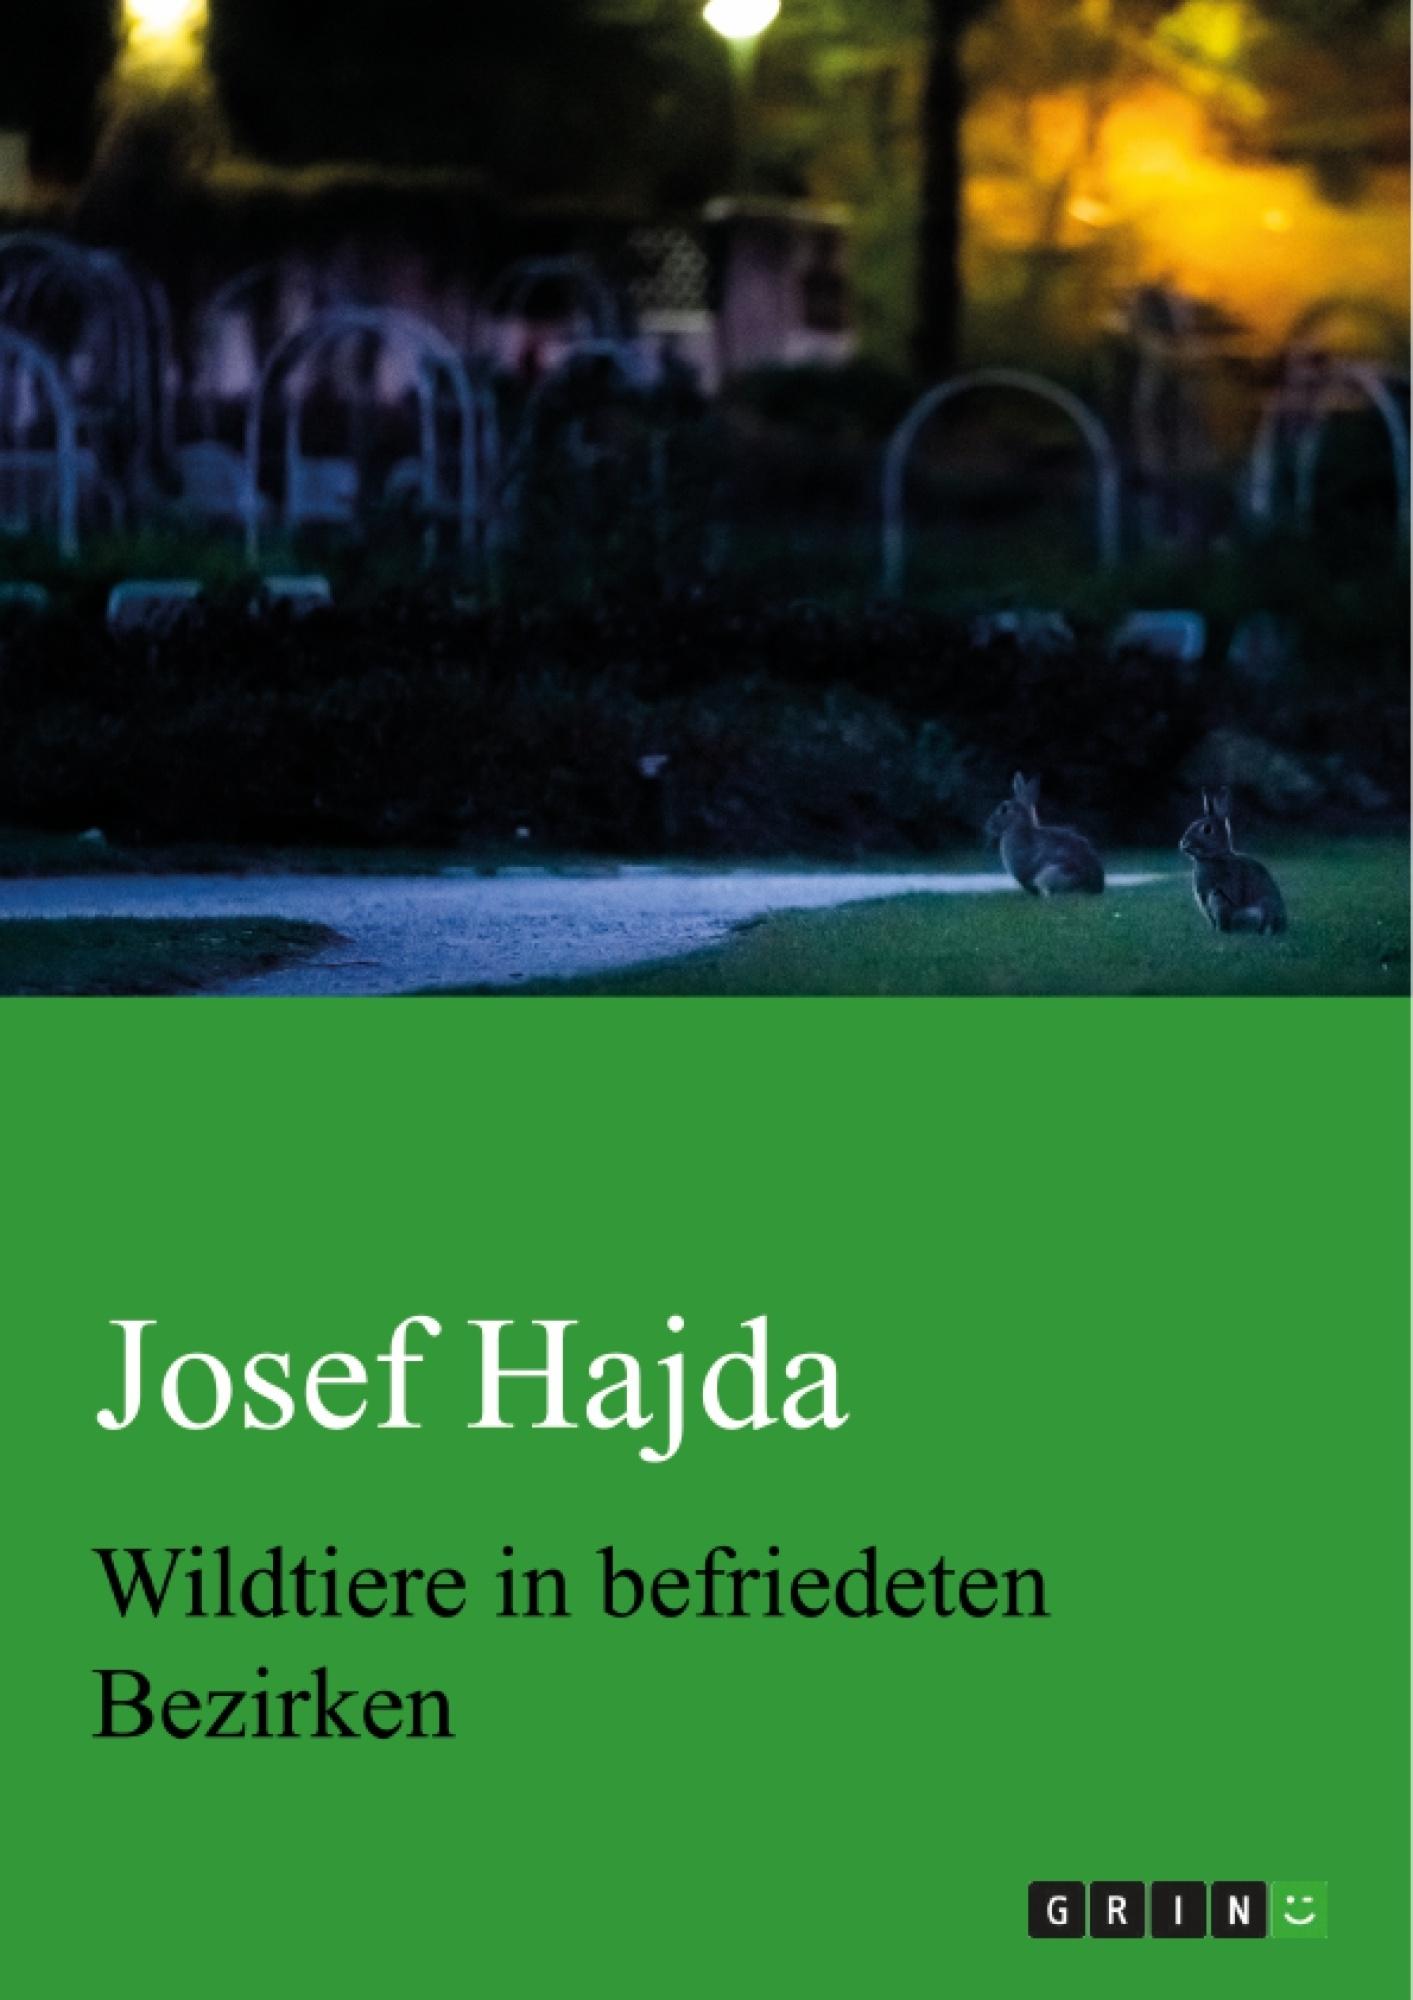 Titel: Wildtiere in befriedeten Bezirken